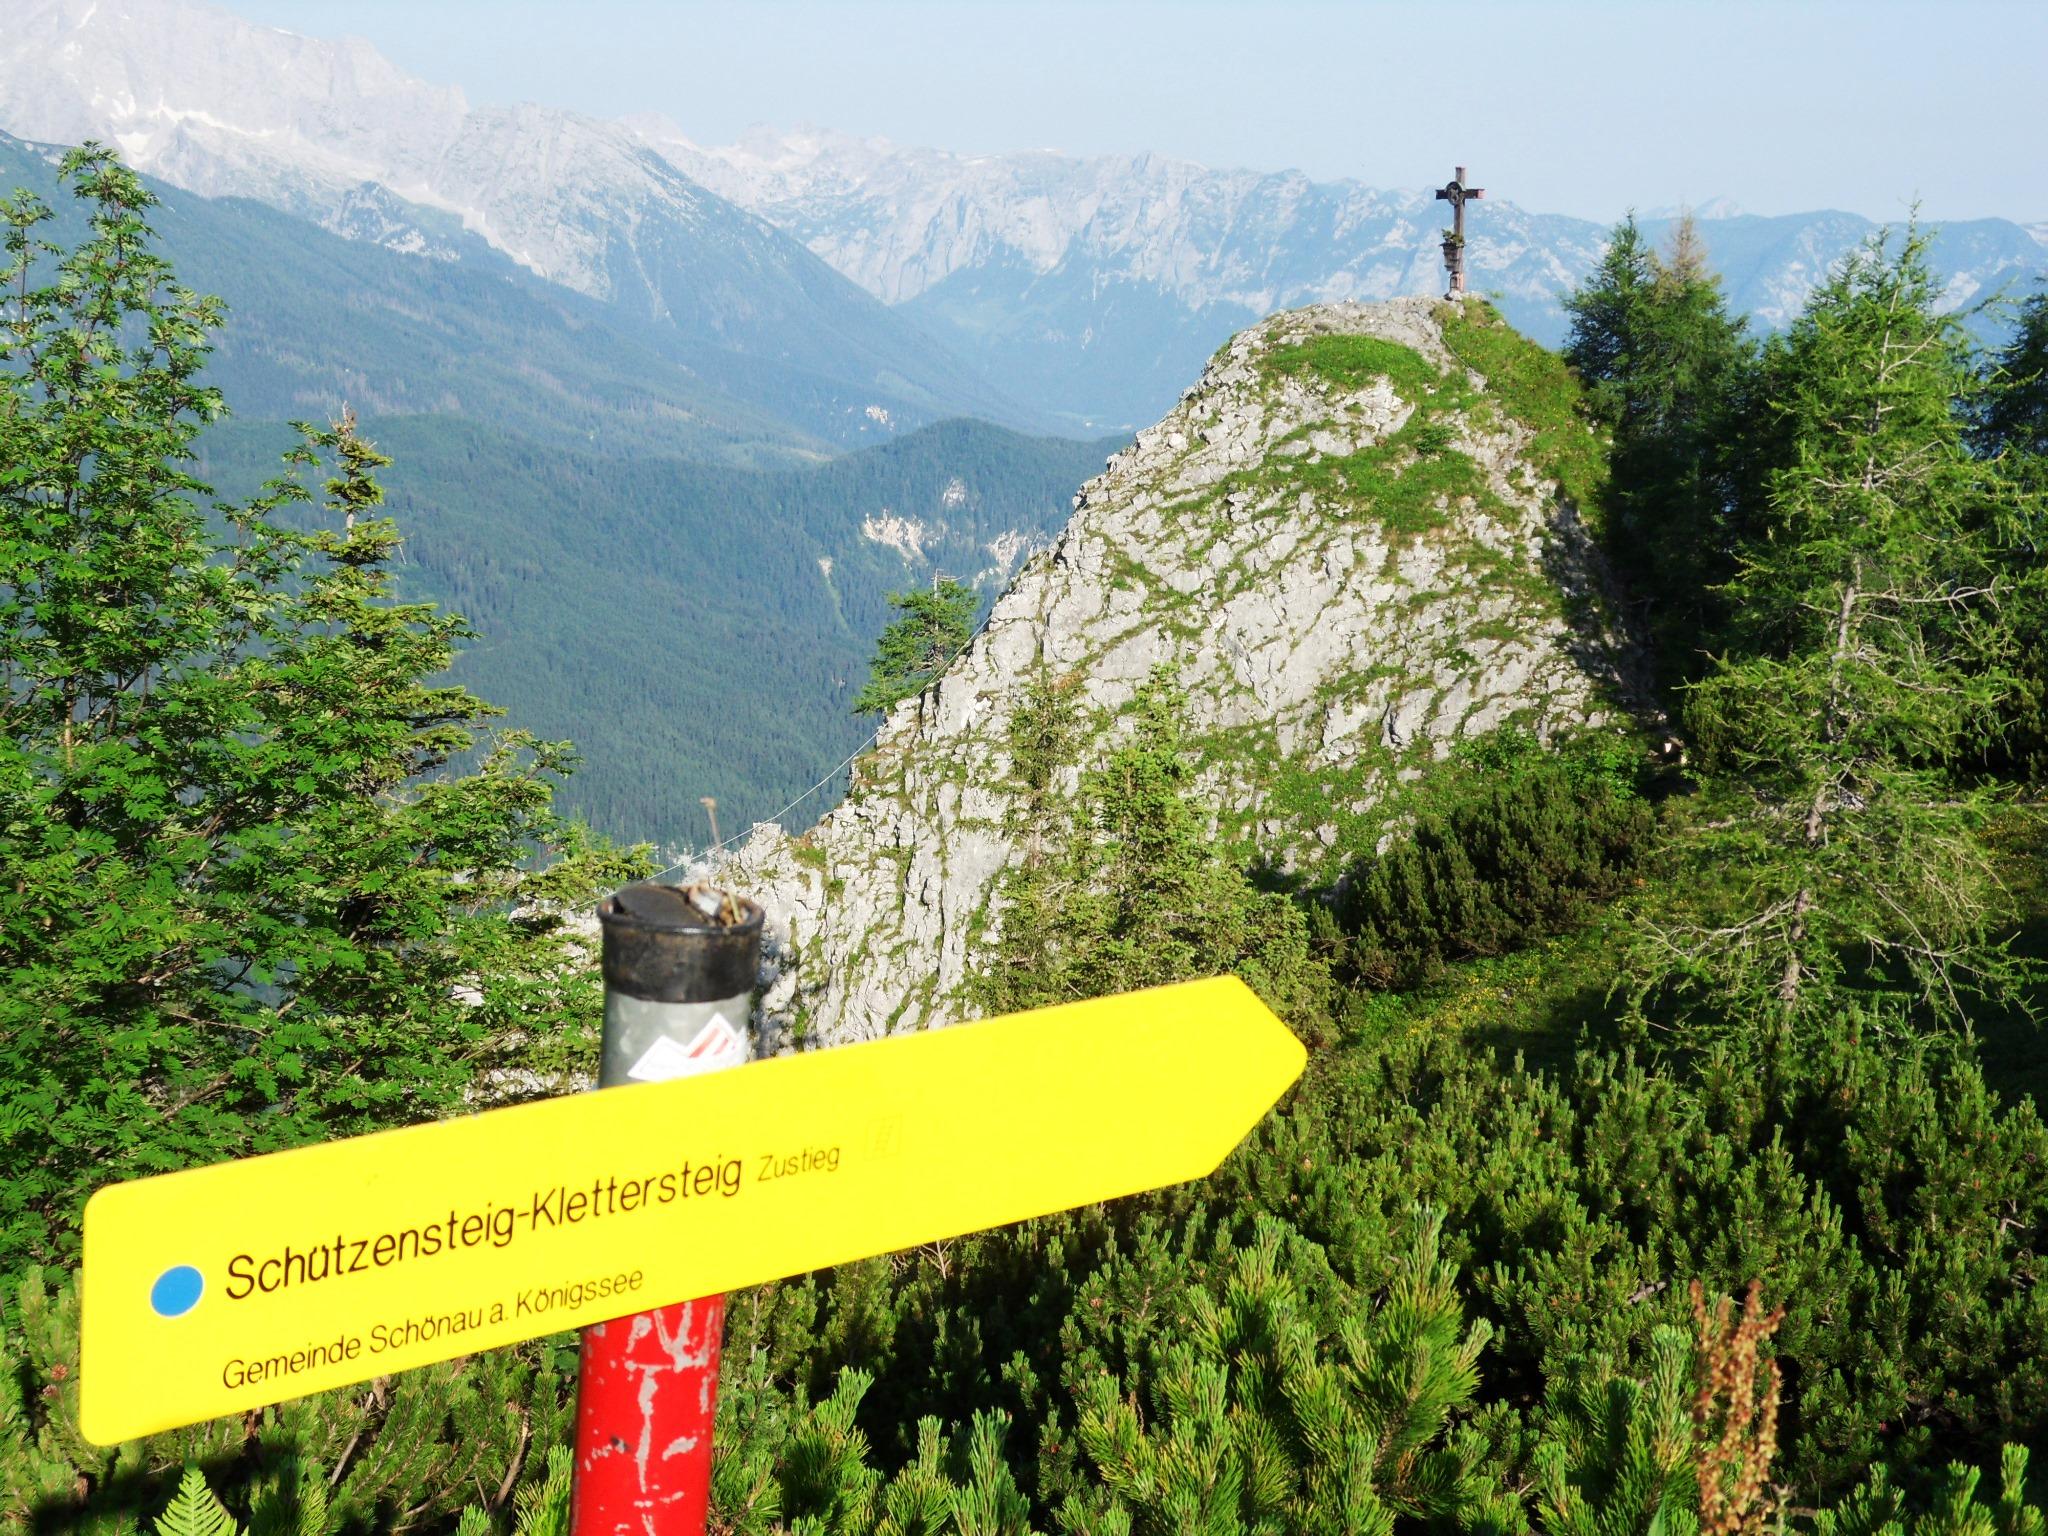 Klettersteig Jenner : Klettersteig archive berchtesgadener land